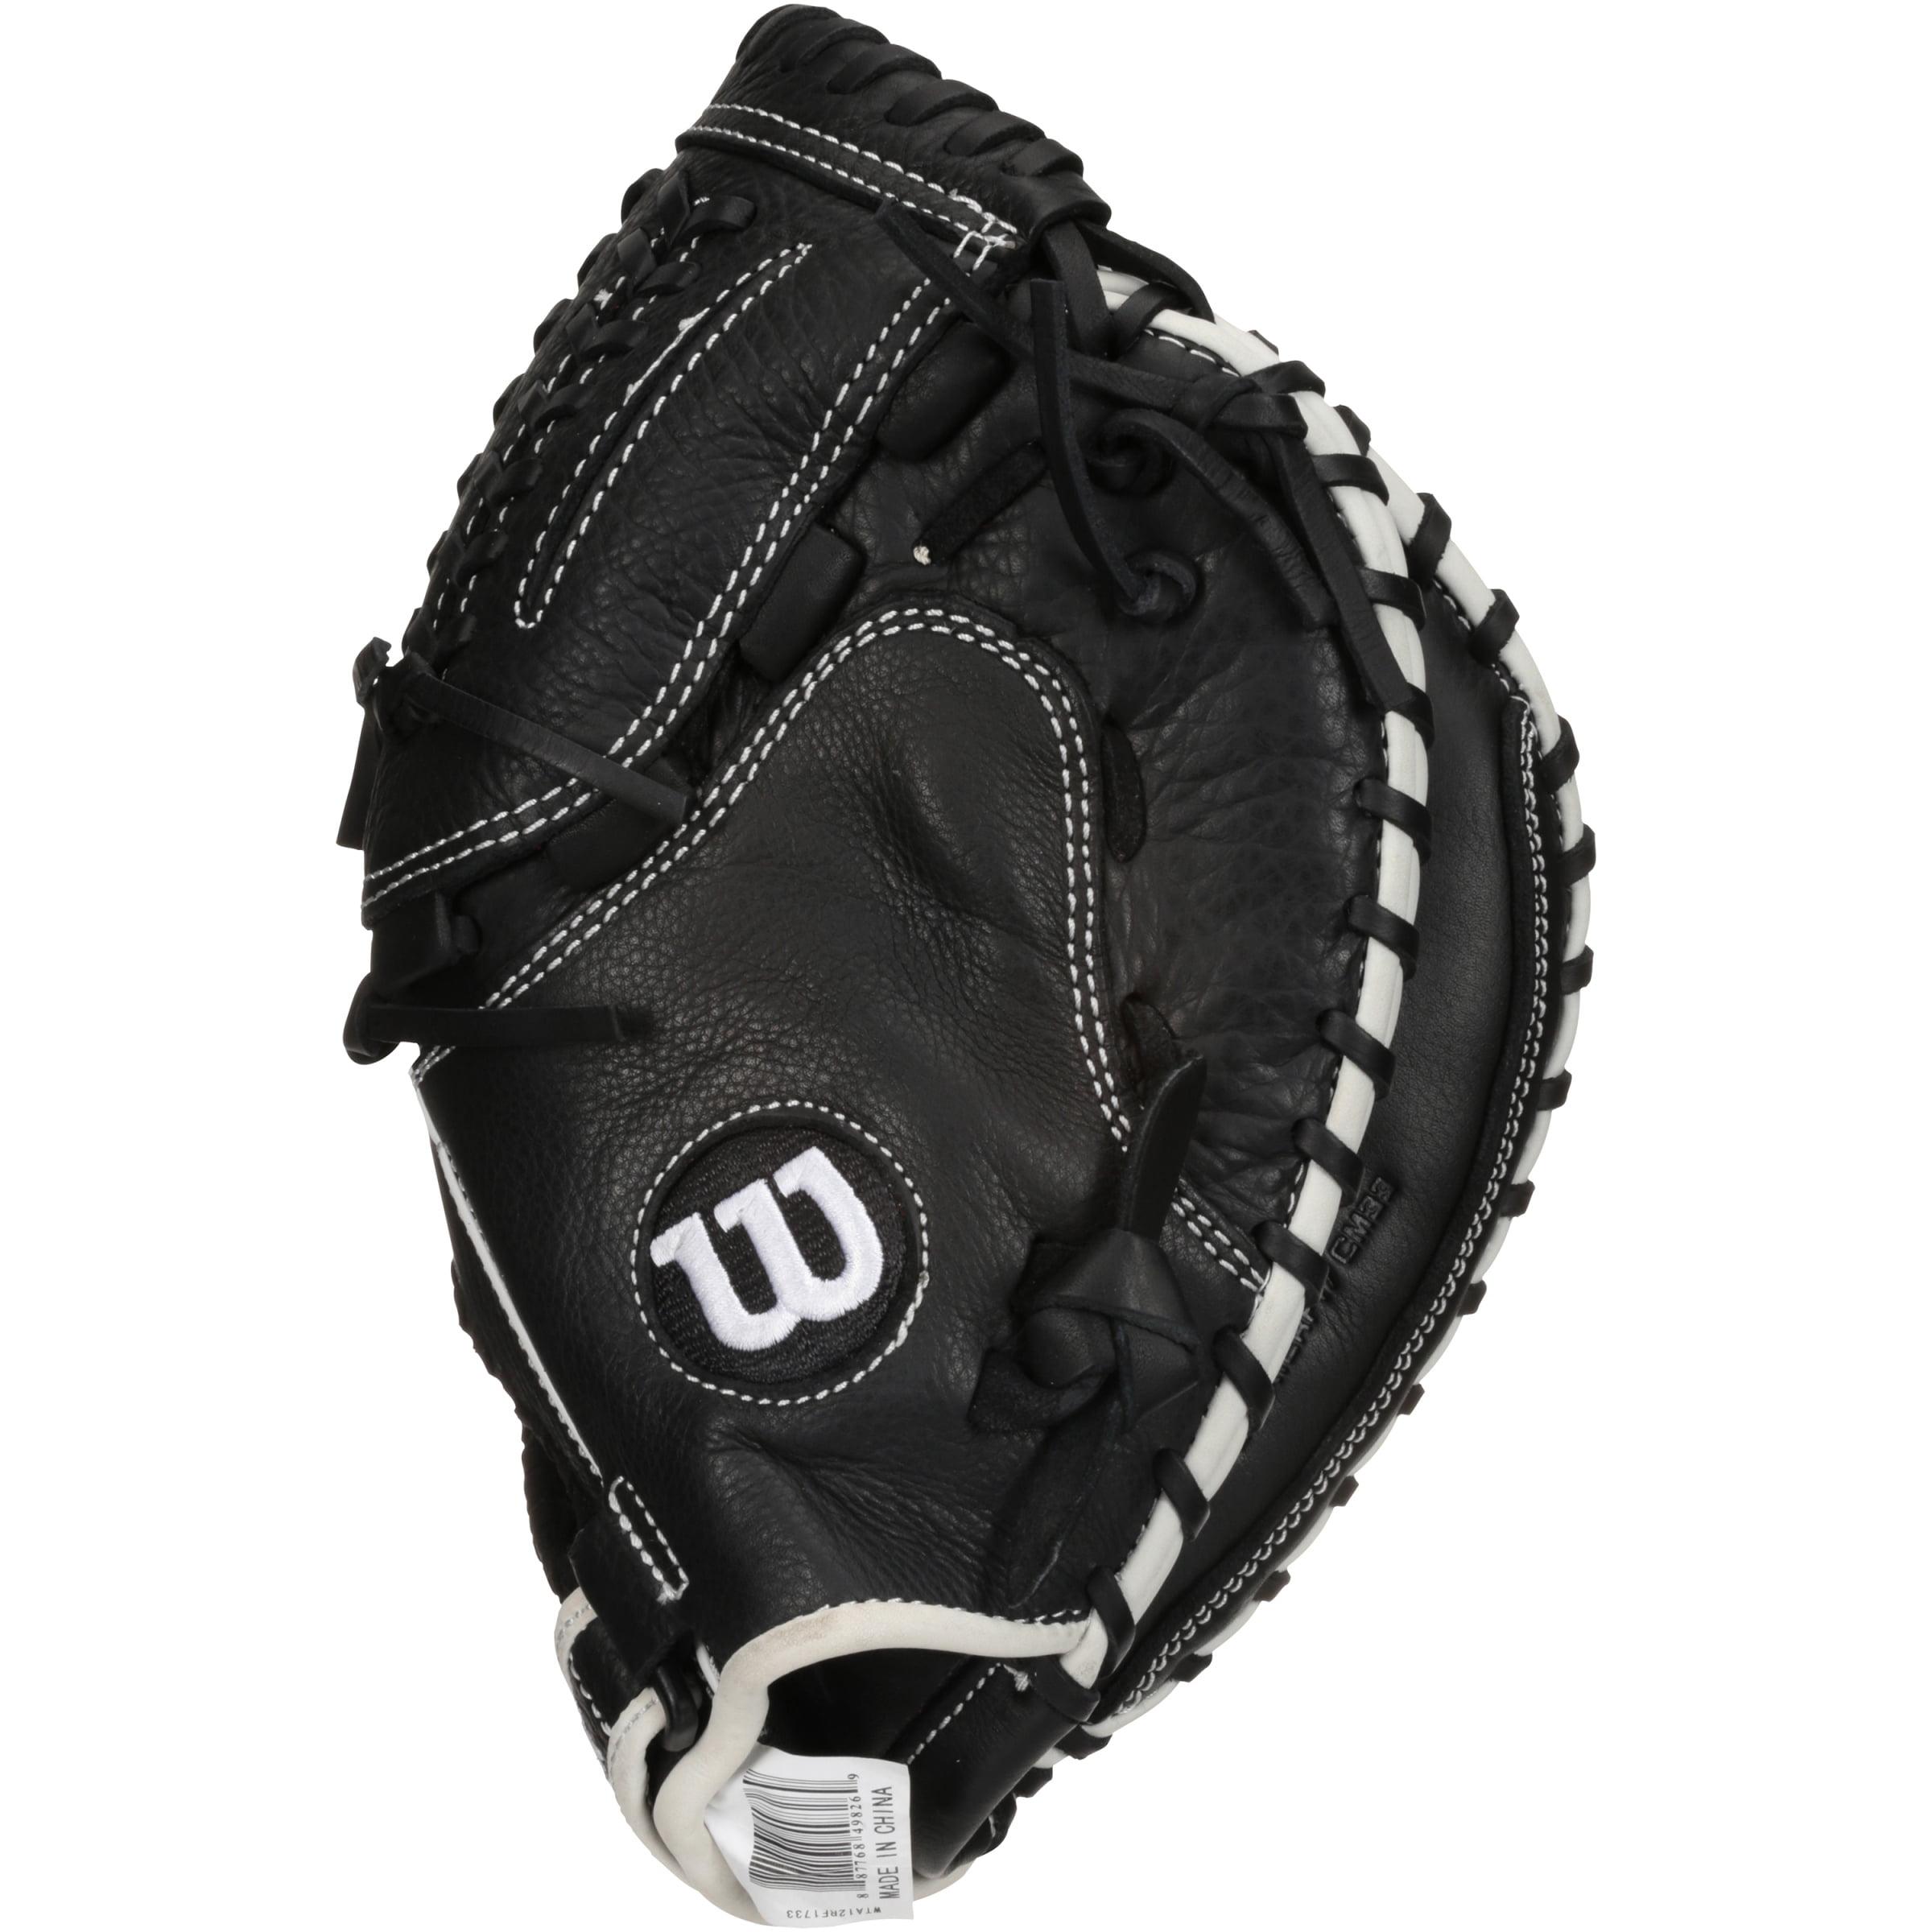 Wilson Onyx Series Adult Catcher's Mitt Ball Glove by Wilson Sporting Goods Co.